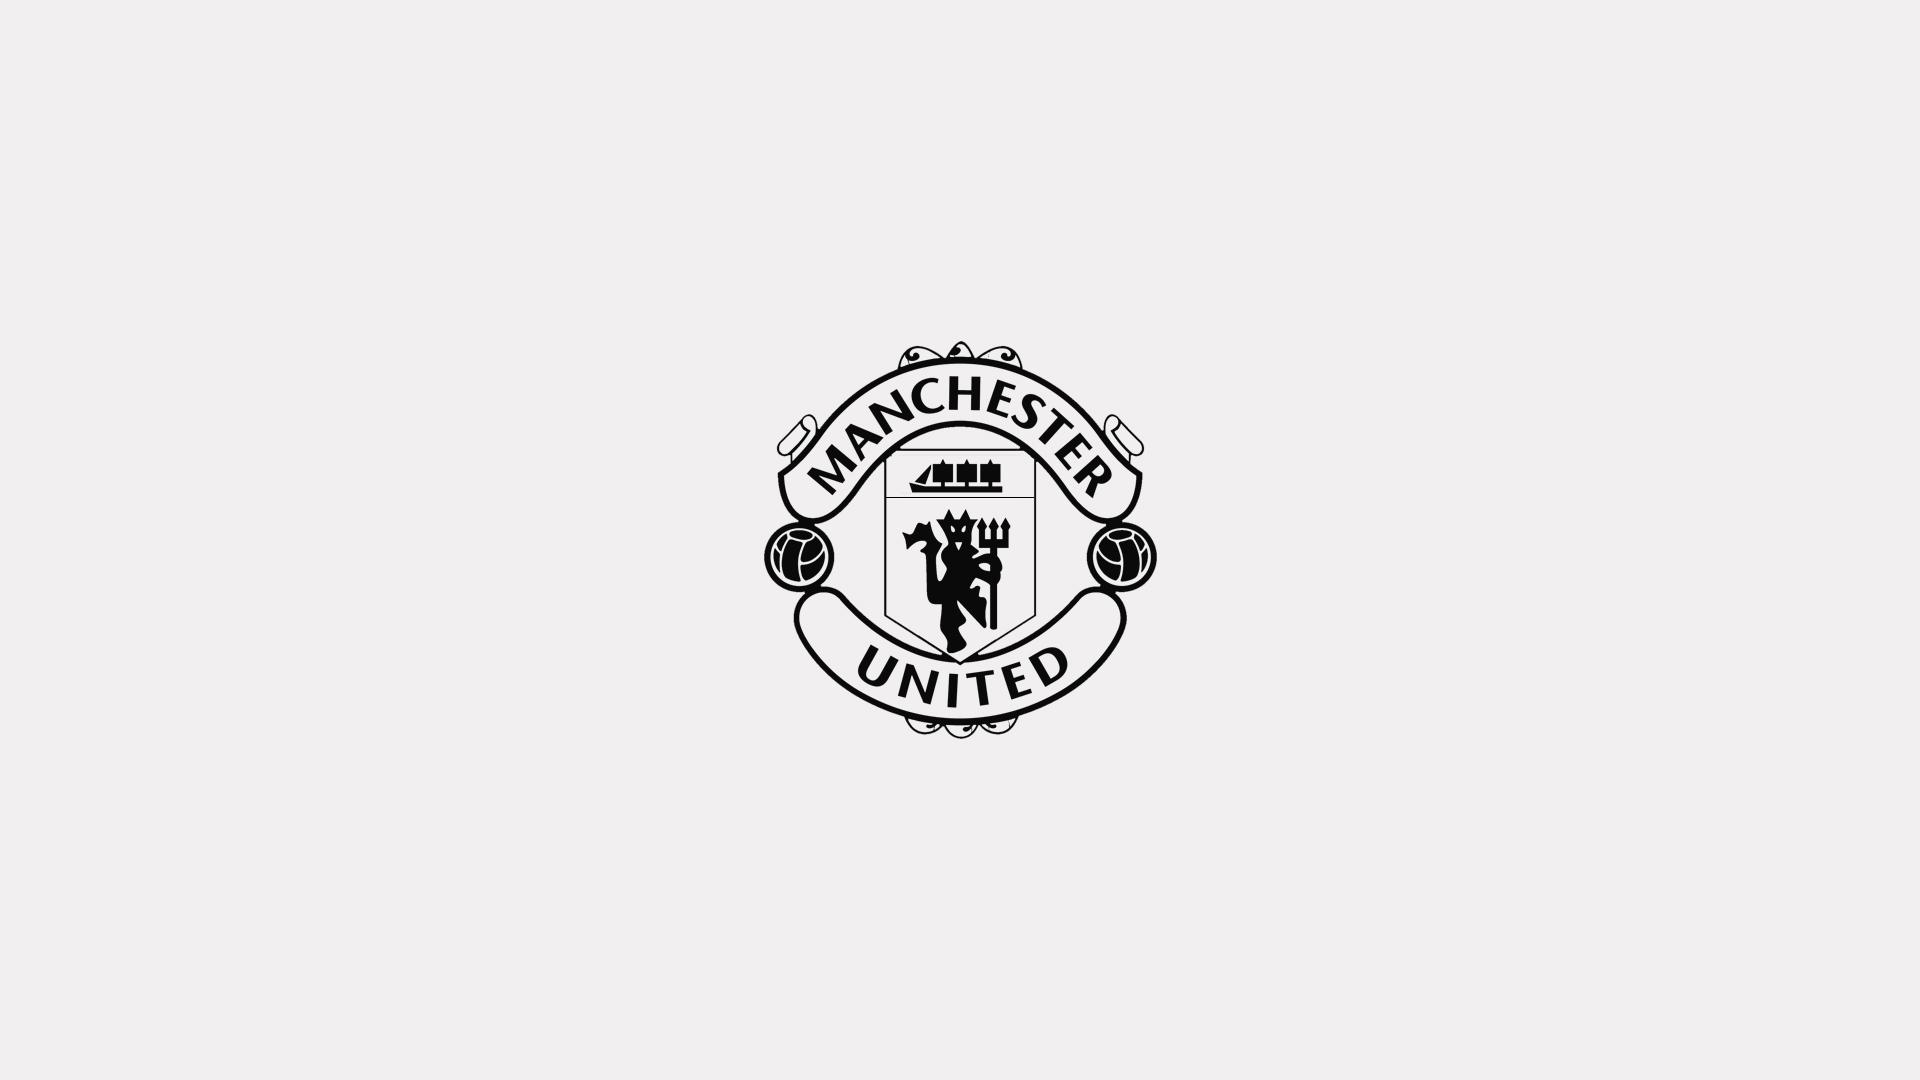 Manchester United скачать